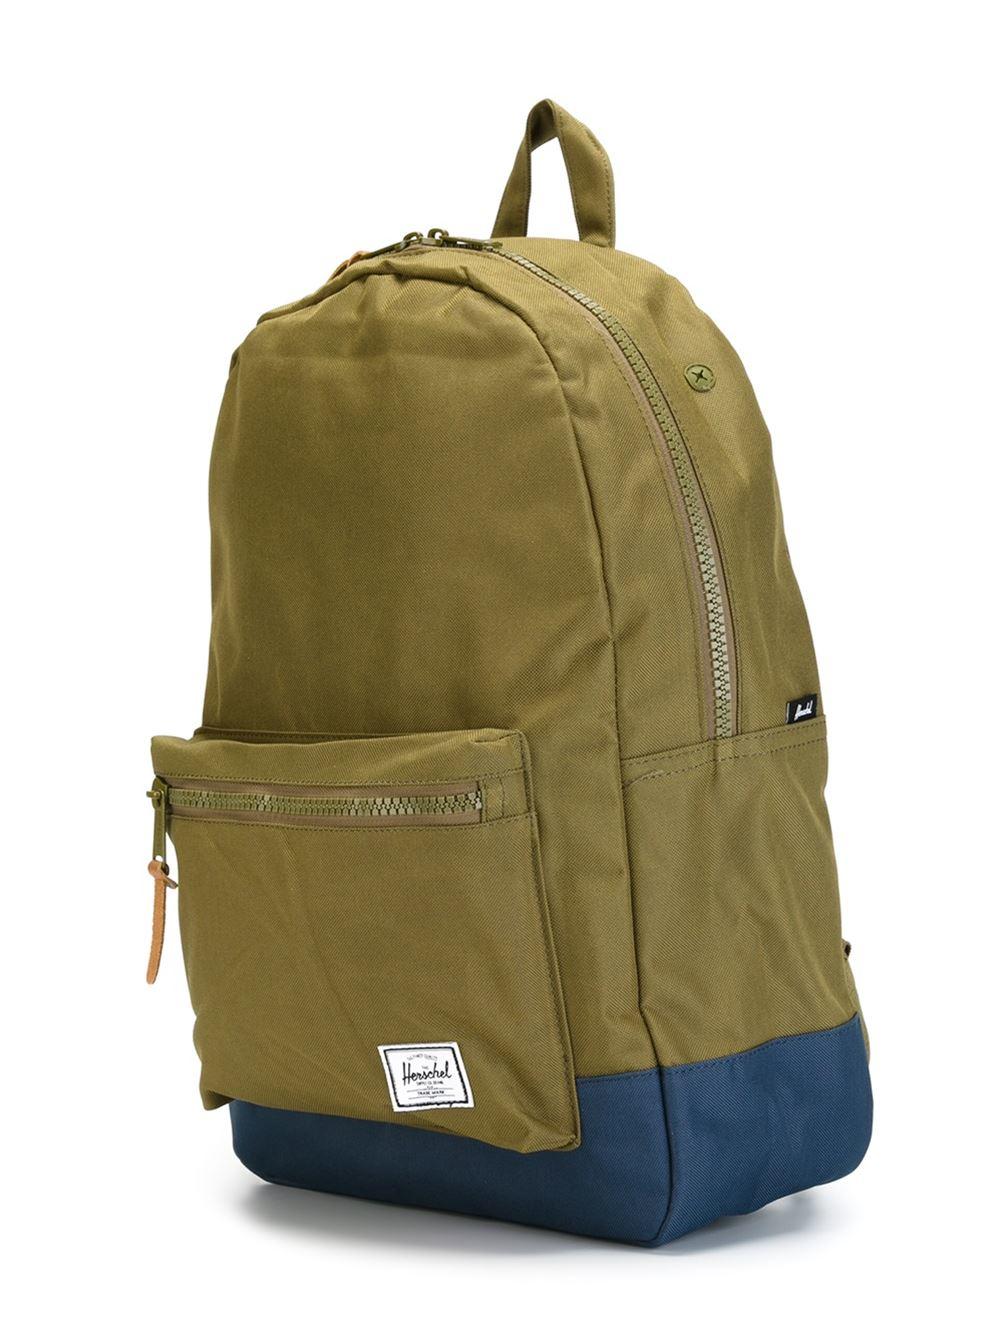 Lyst - Herschel Supply Co.  pop Quiz  Backpack in Green for Men eaf654b2f16d9